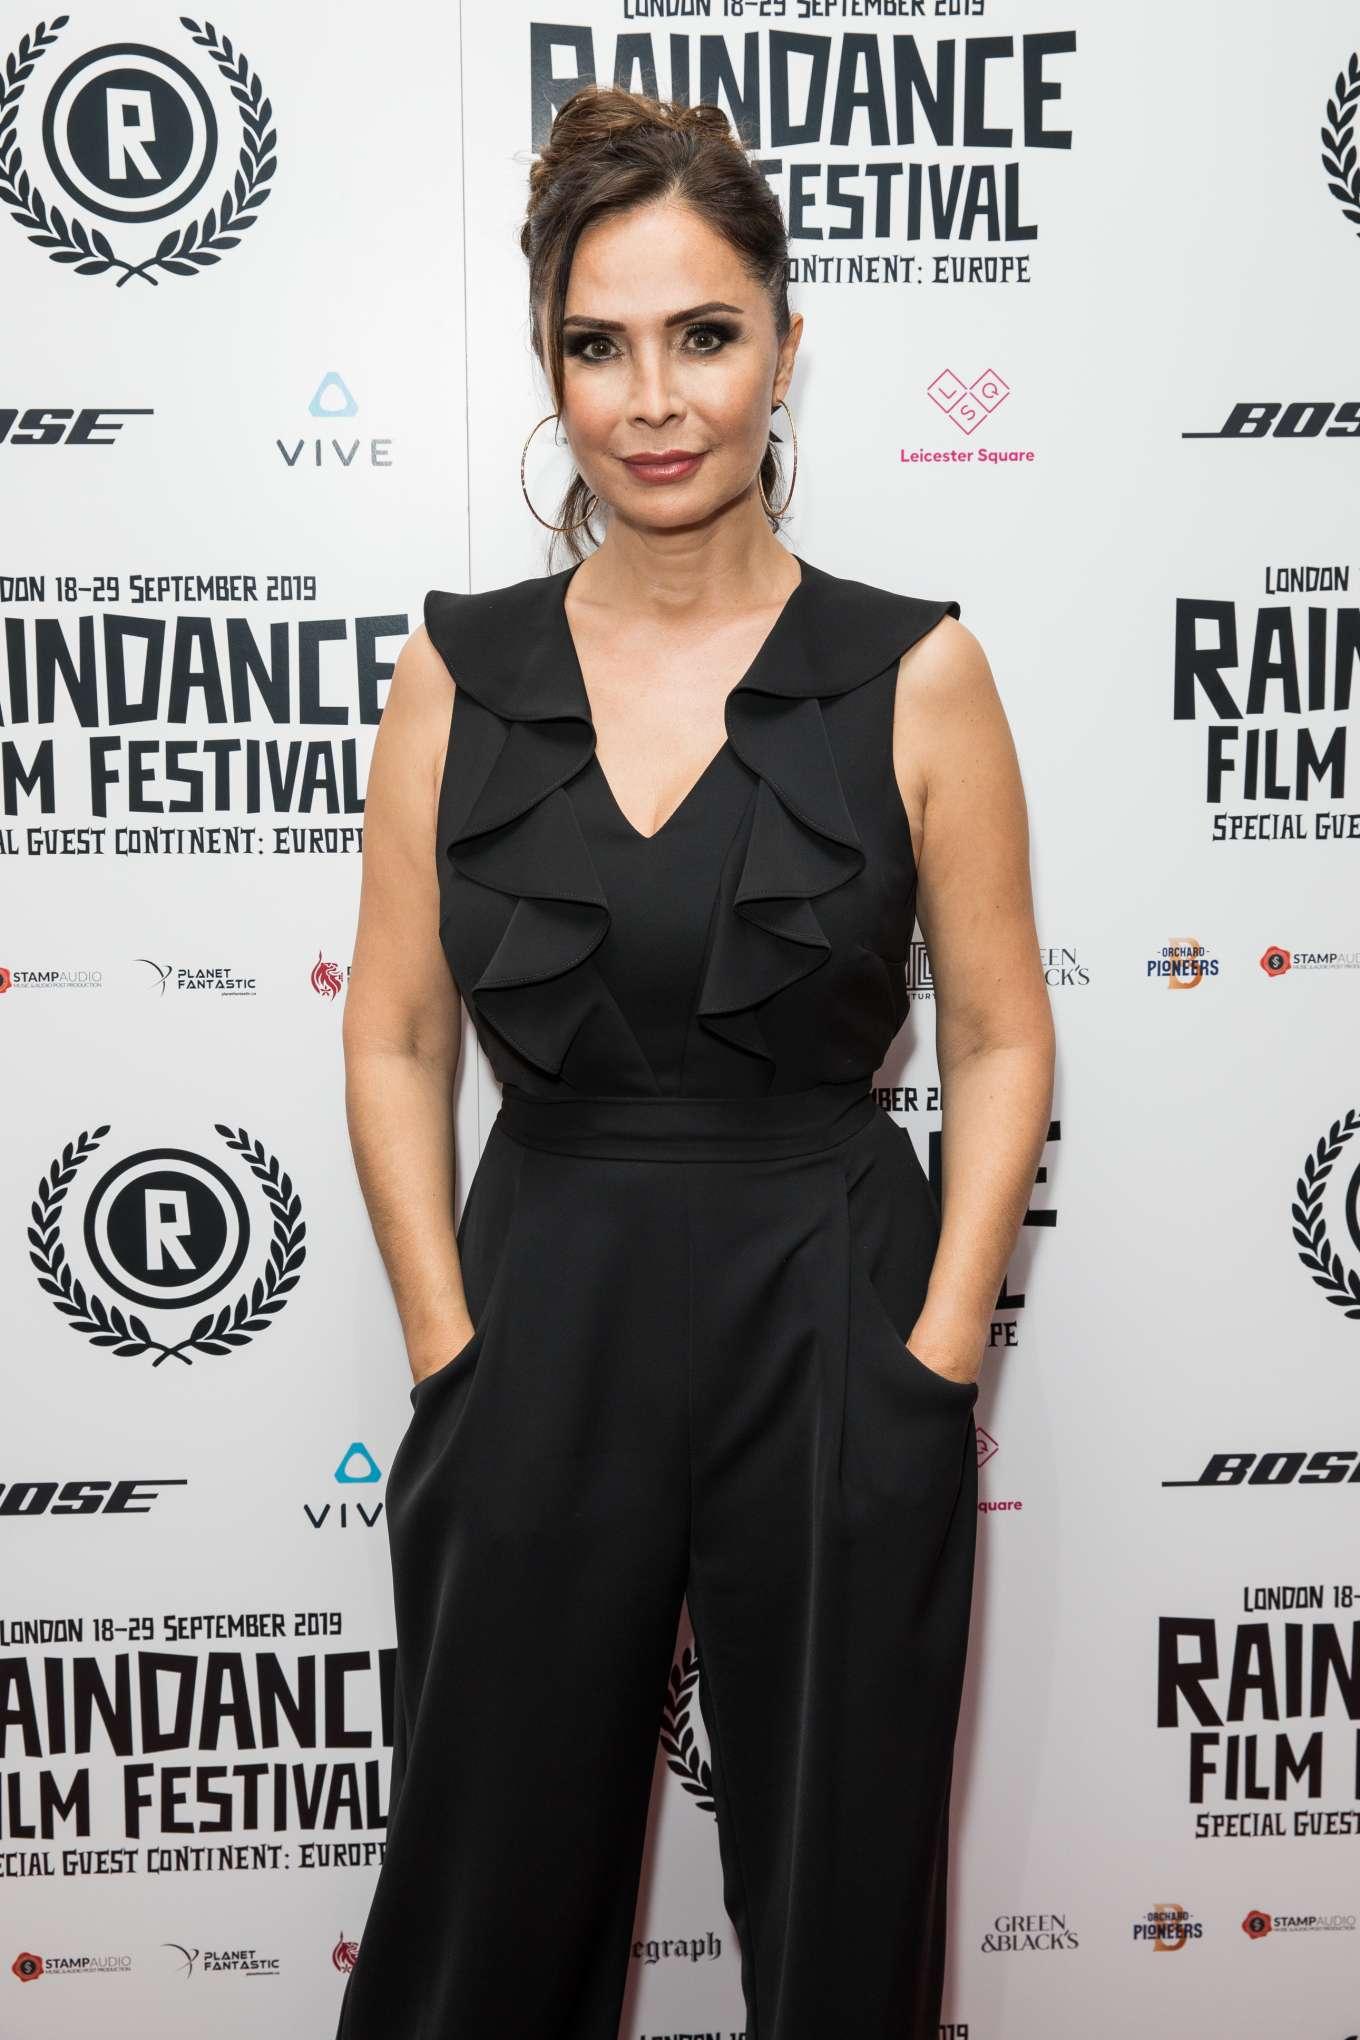 Talisa Garcia - 'Vue West End' Premiere at Raindance Film Festival in London